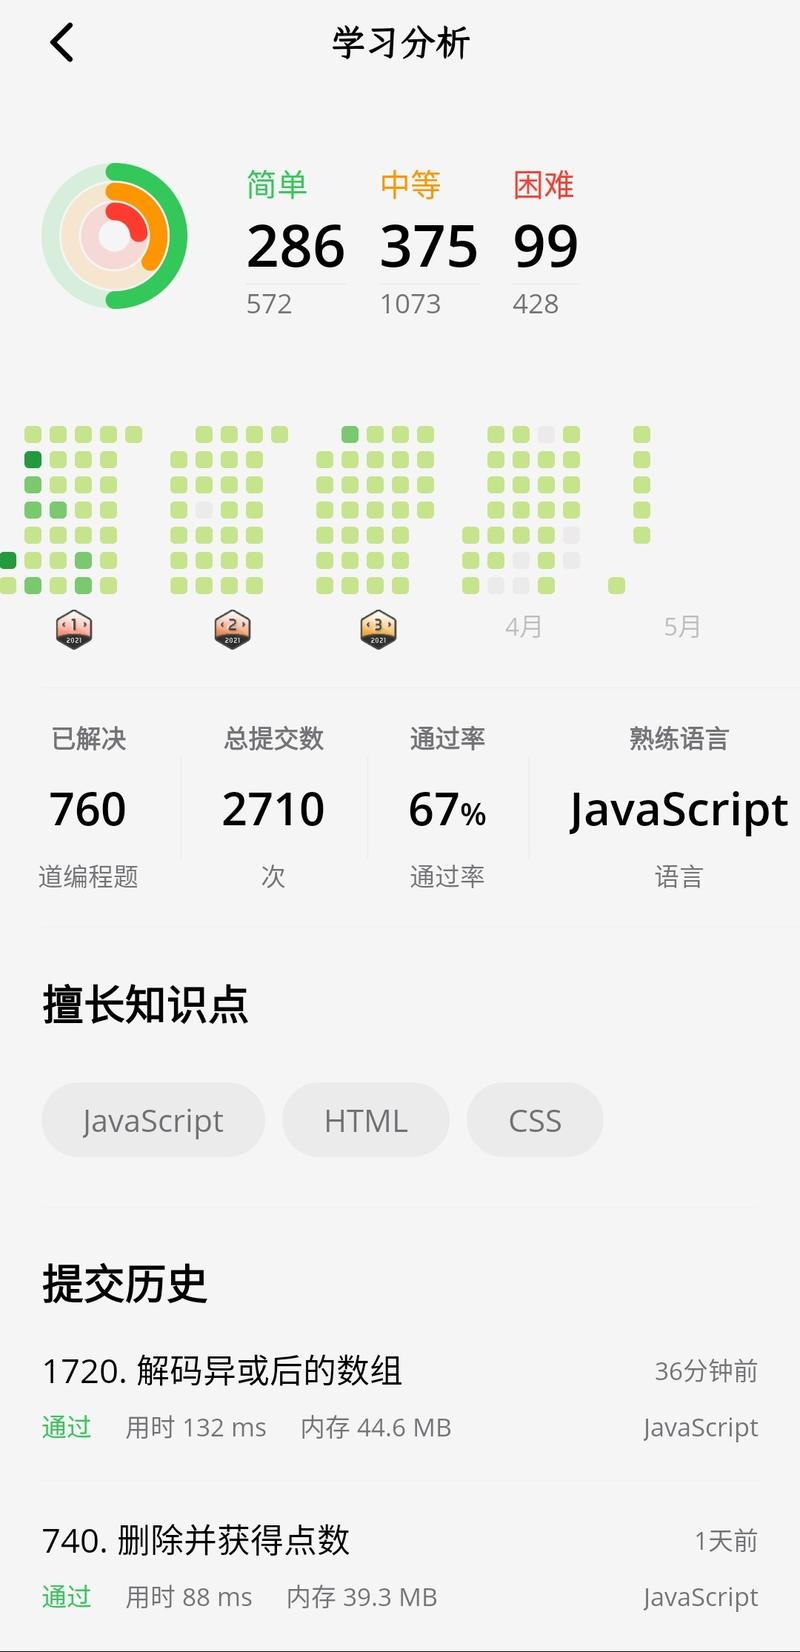 chiyu1996于2021-05-06 15:16发布的图片